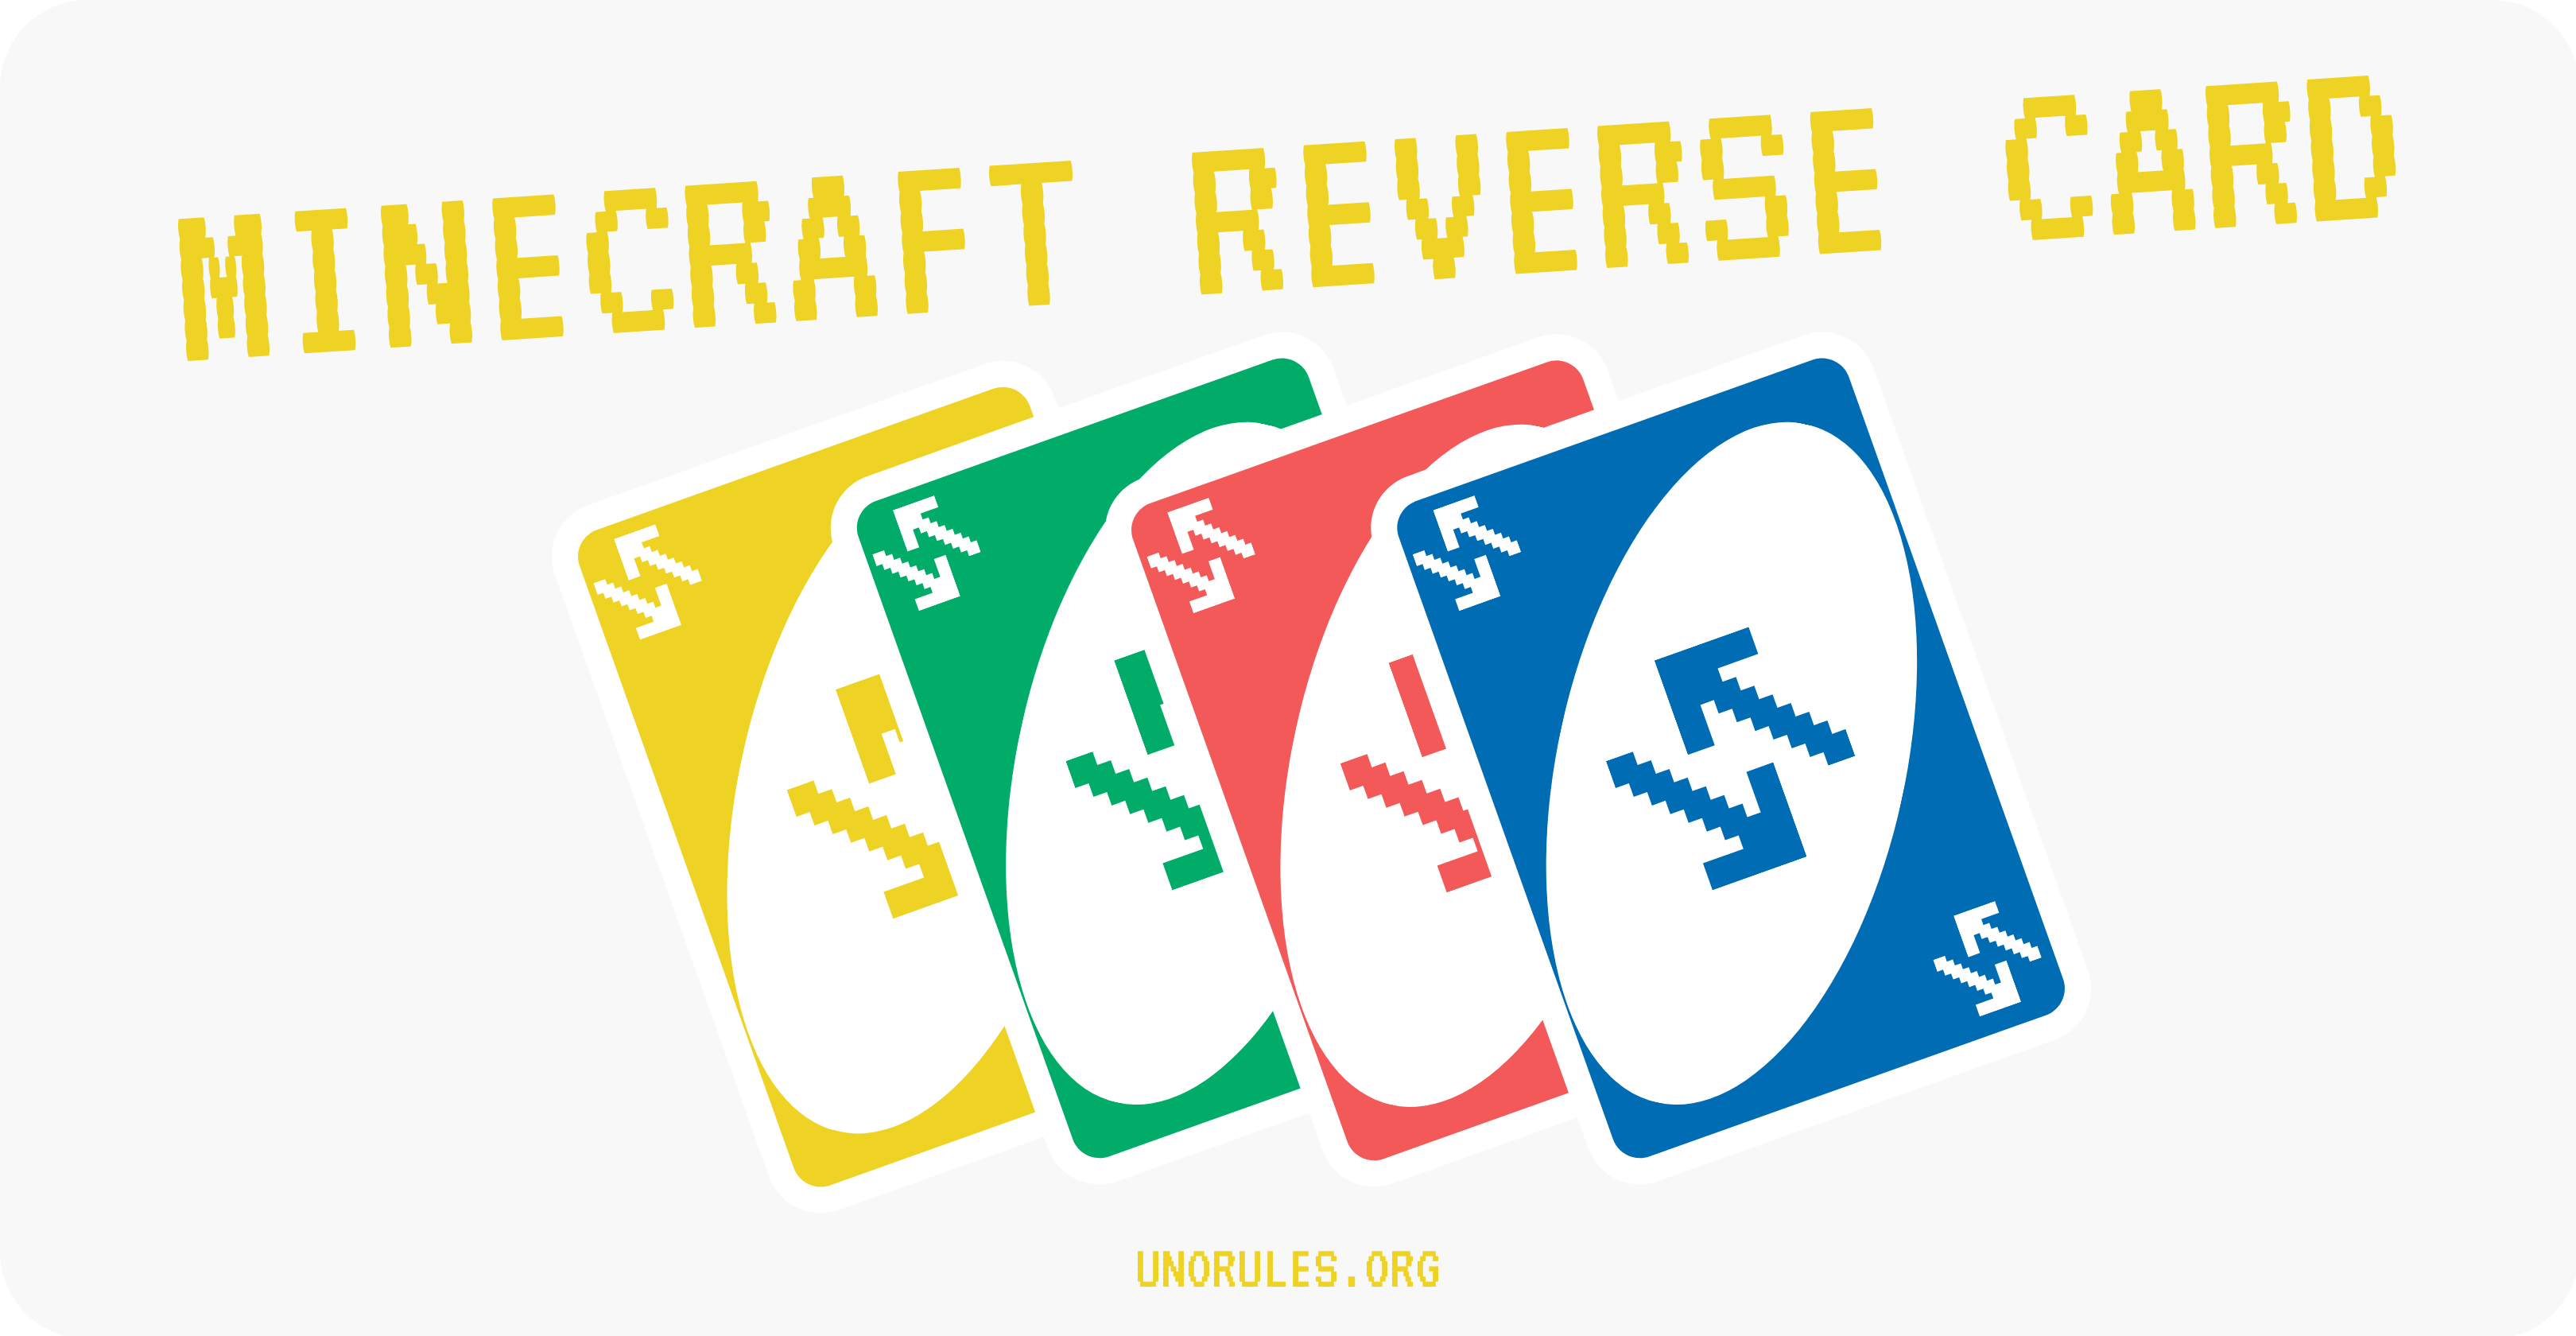 Uno reverse card minecraft version unorules.org